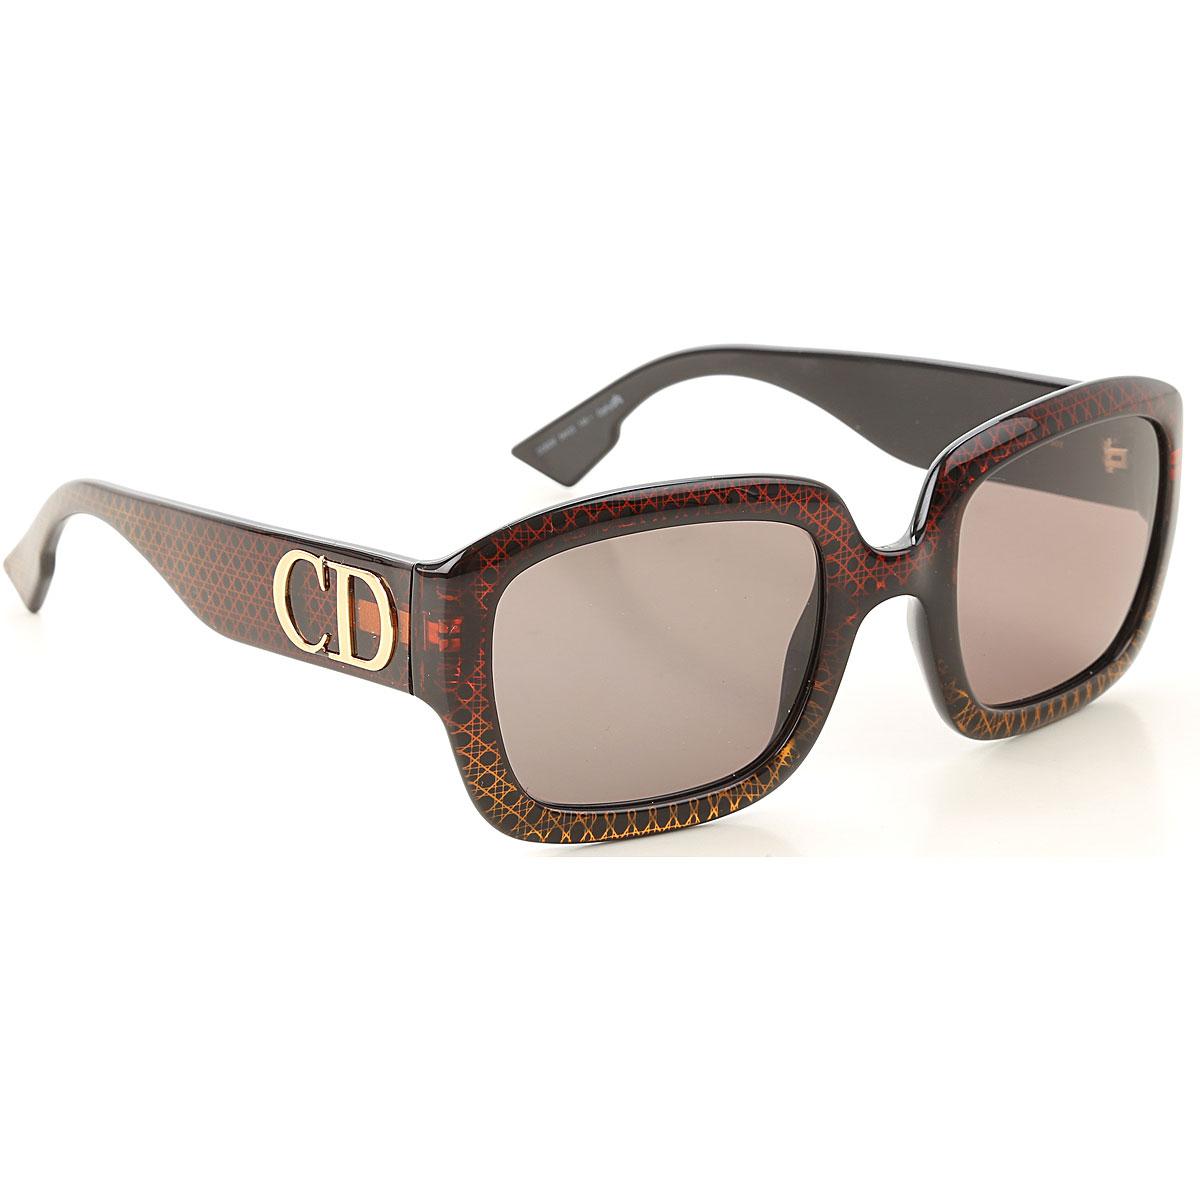 Christian Dior Sunglasses On Sale, Brown, 2019